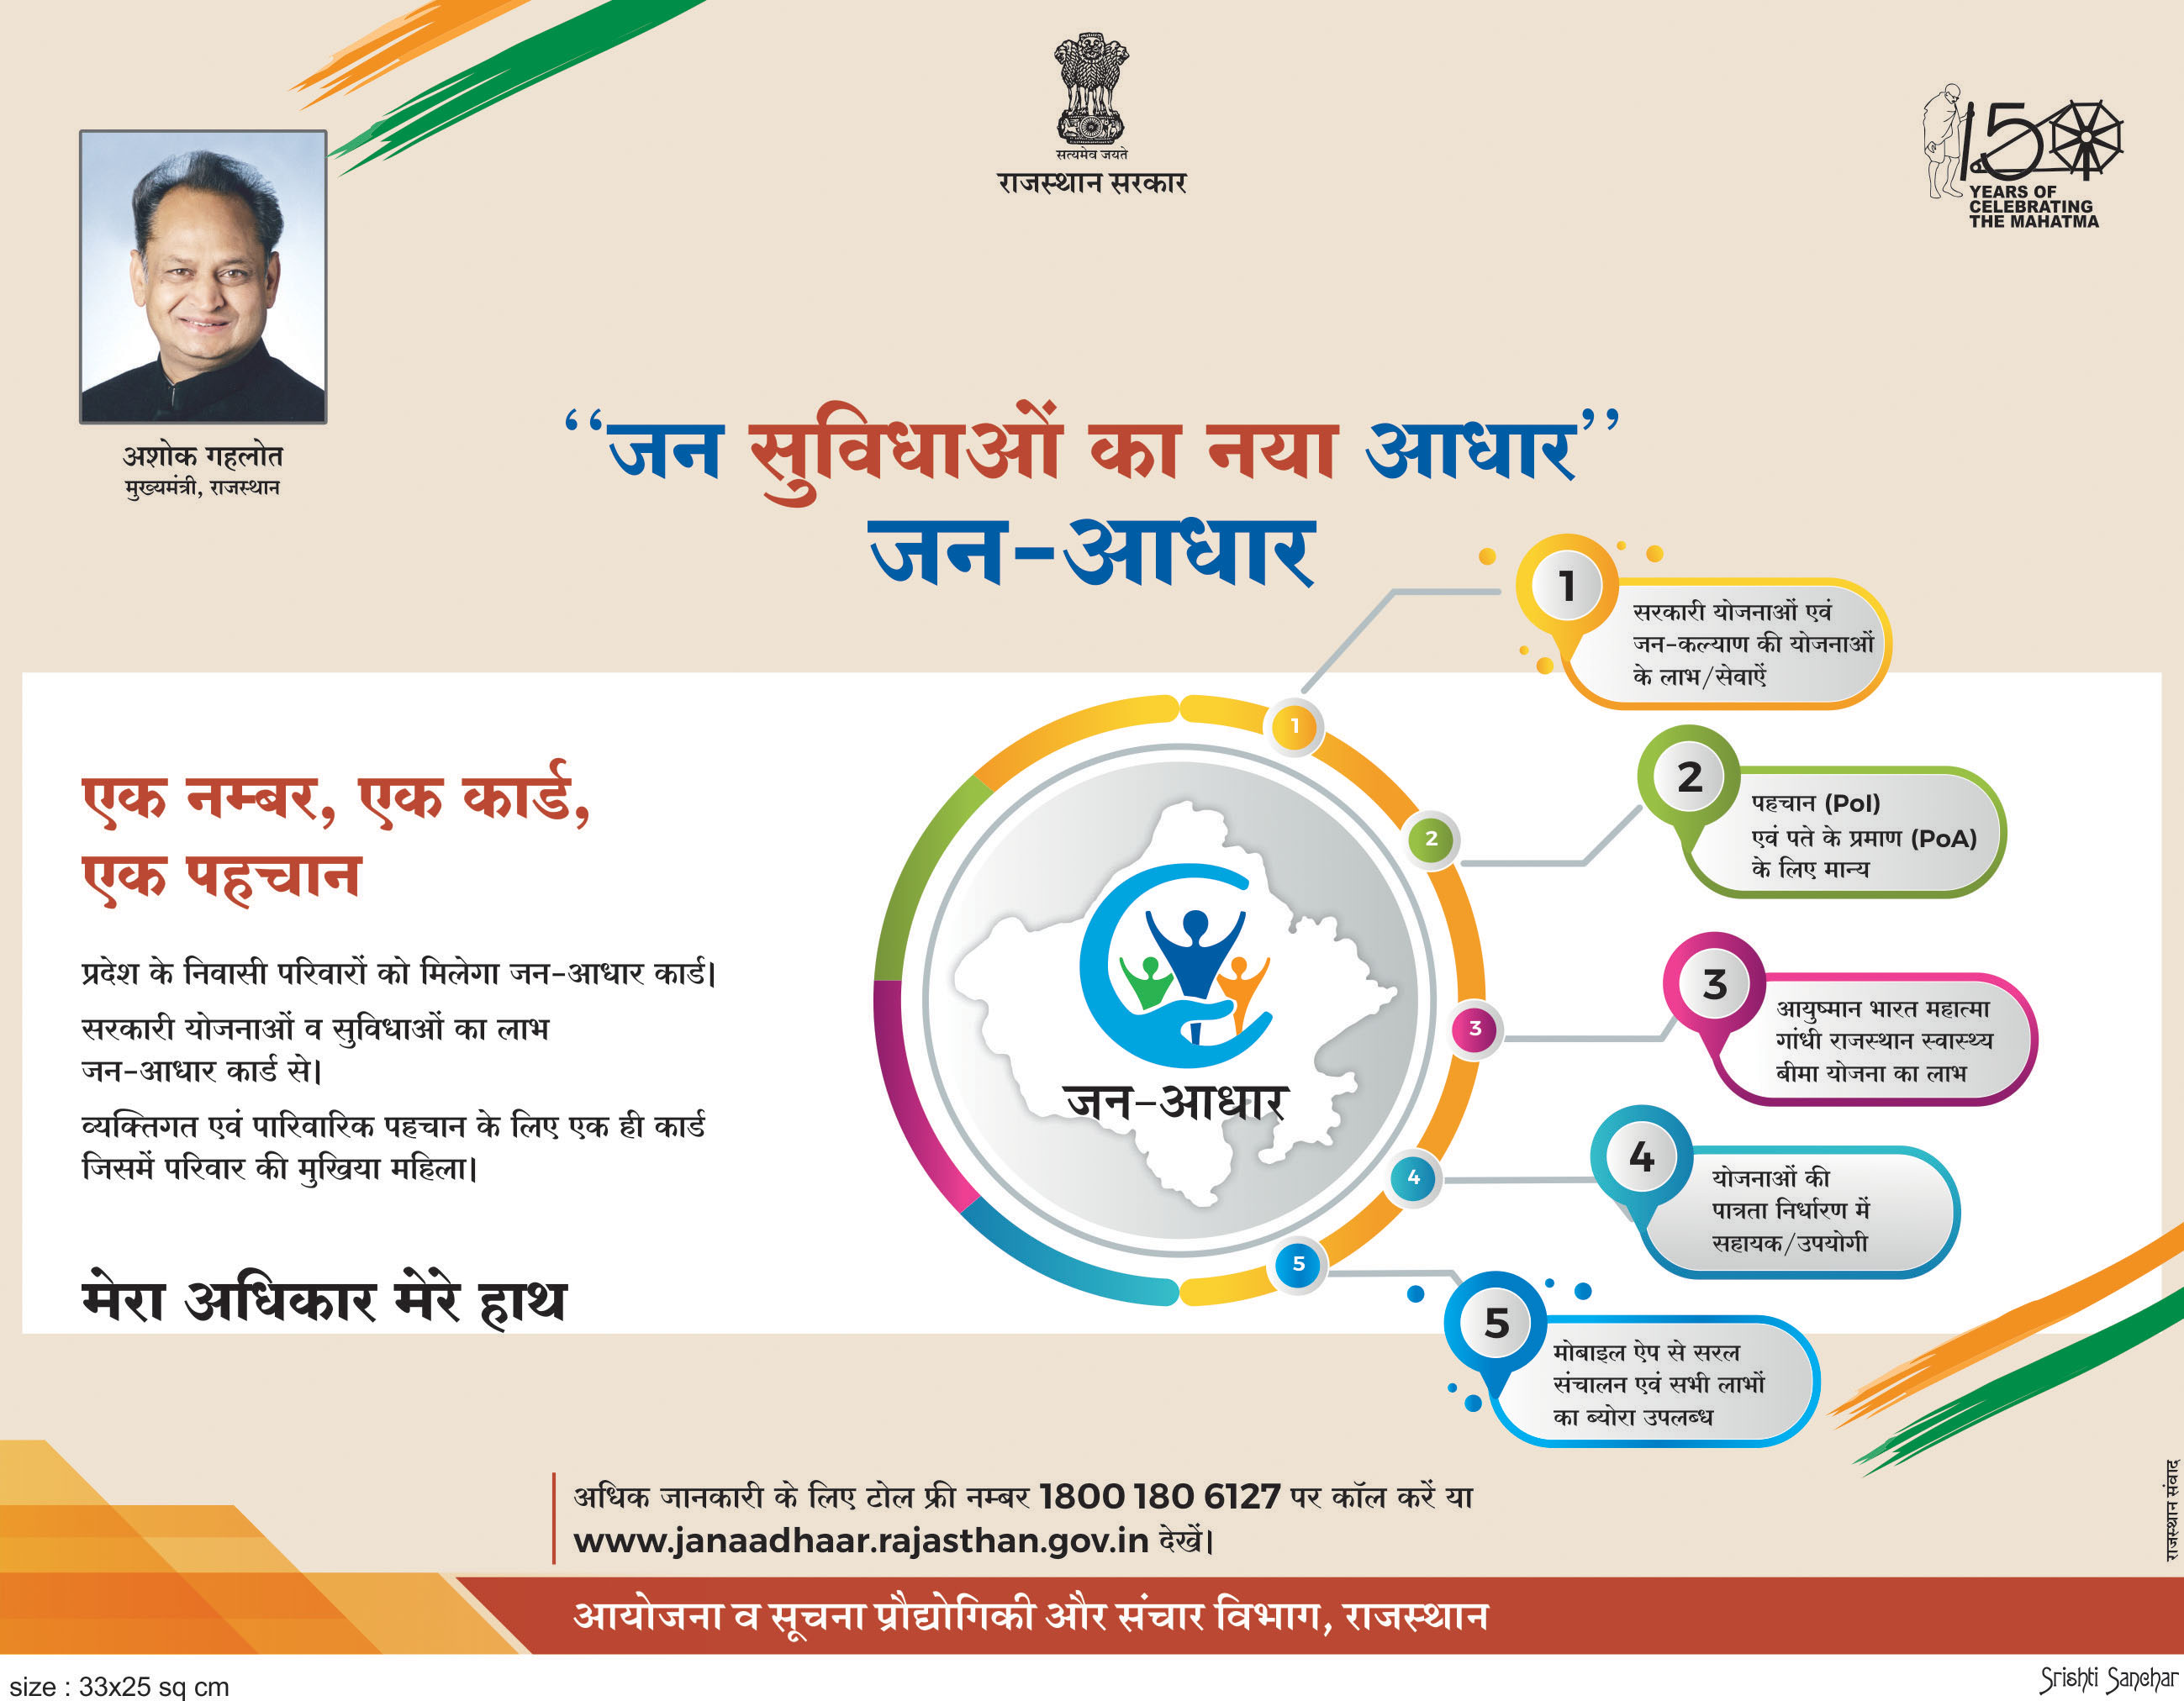 राजस्थान जन आधार योजना लाभ